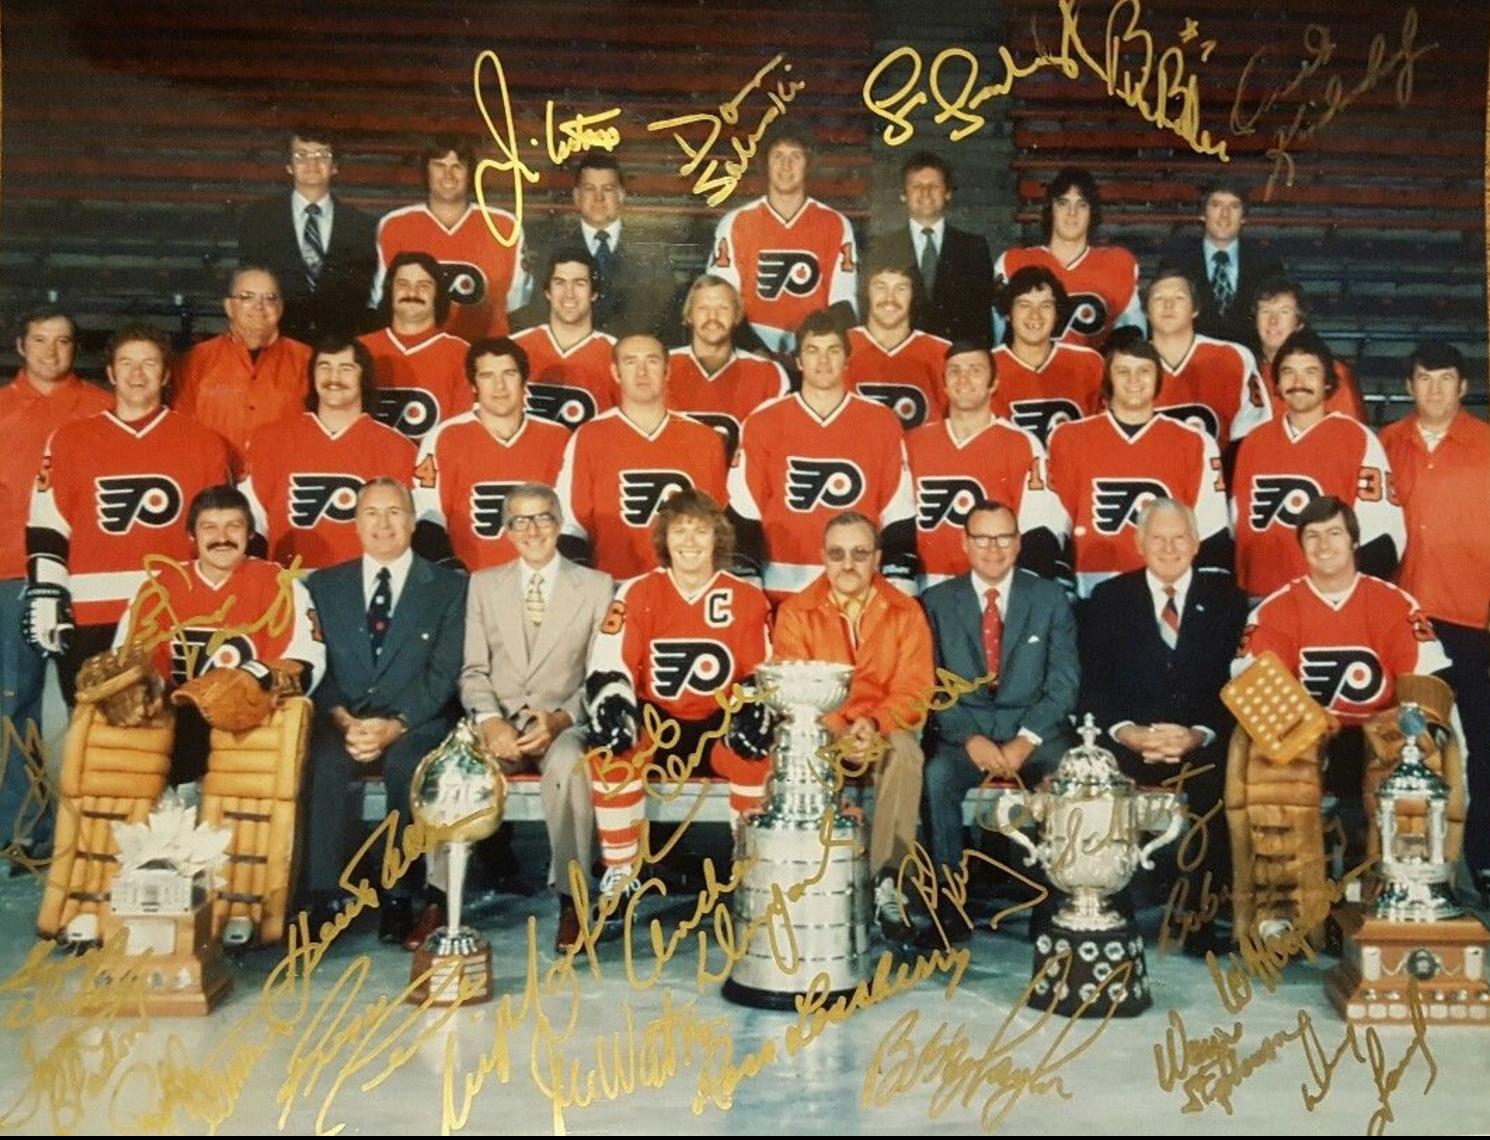 Philadelphia Flyers 1975 Stanley Cup Champions Autographed